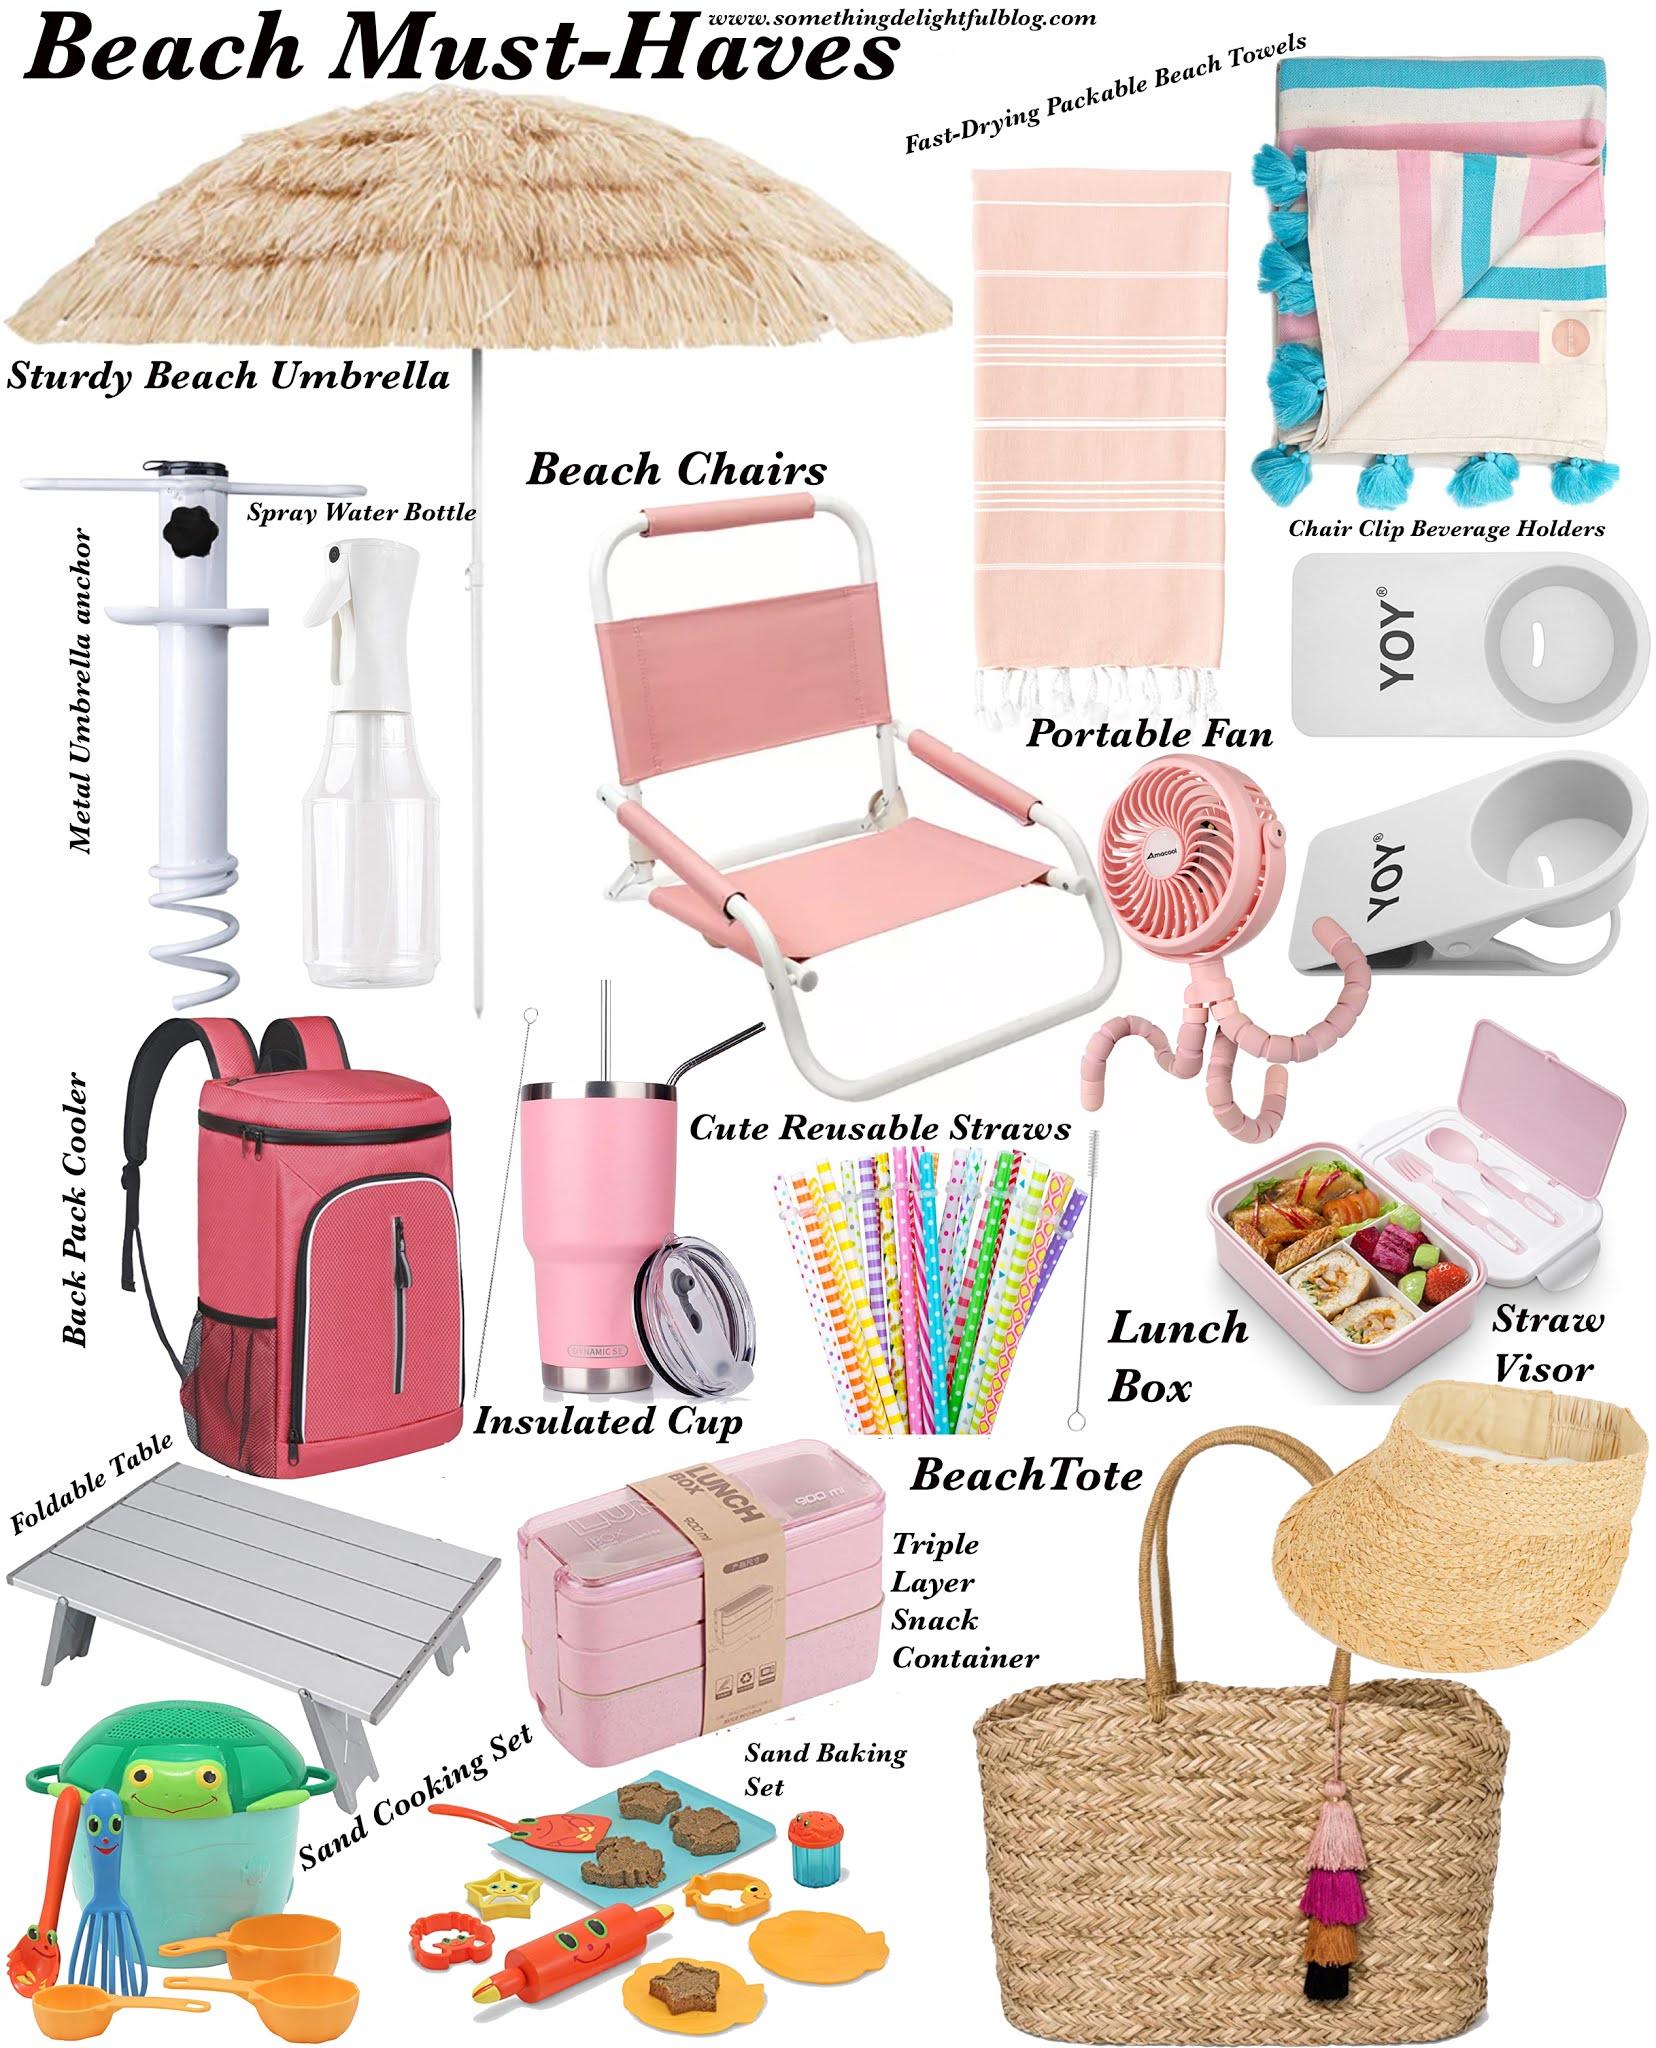 Beach Must-Have Items - Something Delightful Blog #BeachMustHaves #BeachWithKids #BeachAccessories #AmazonBeachFinds